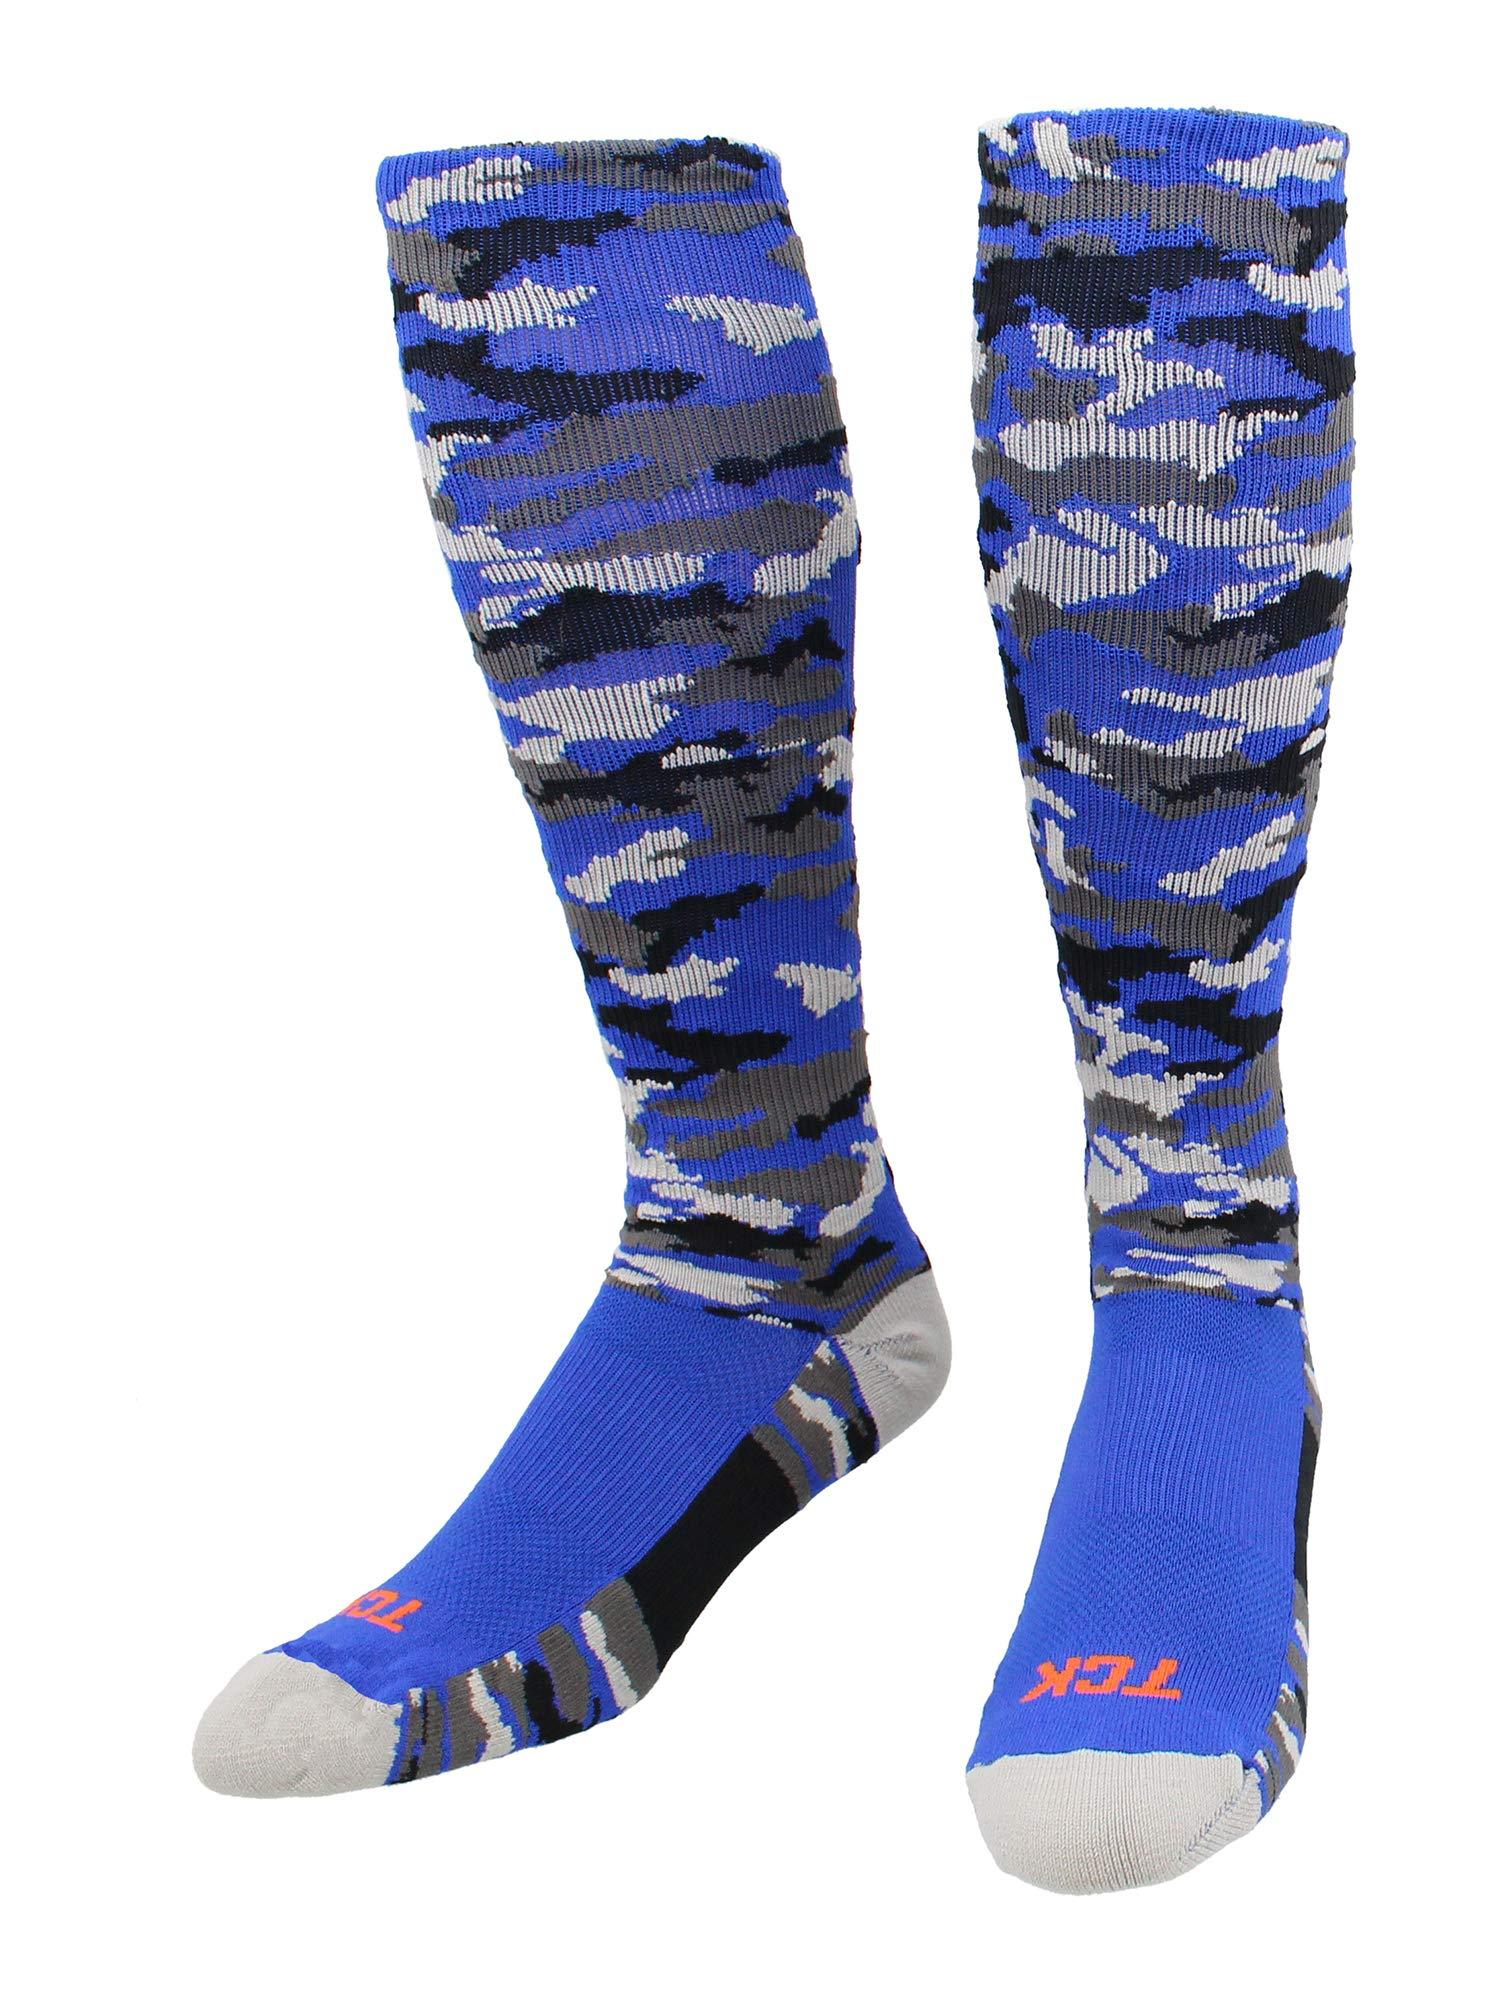 TCK Sports Elite Performance Over The Calf Camo Socks